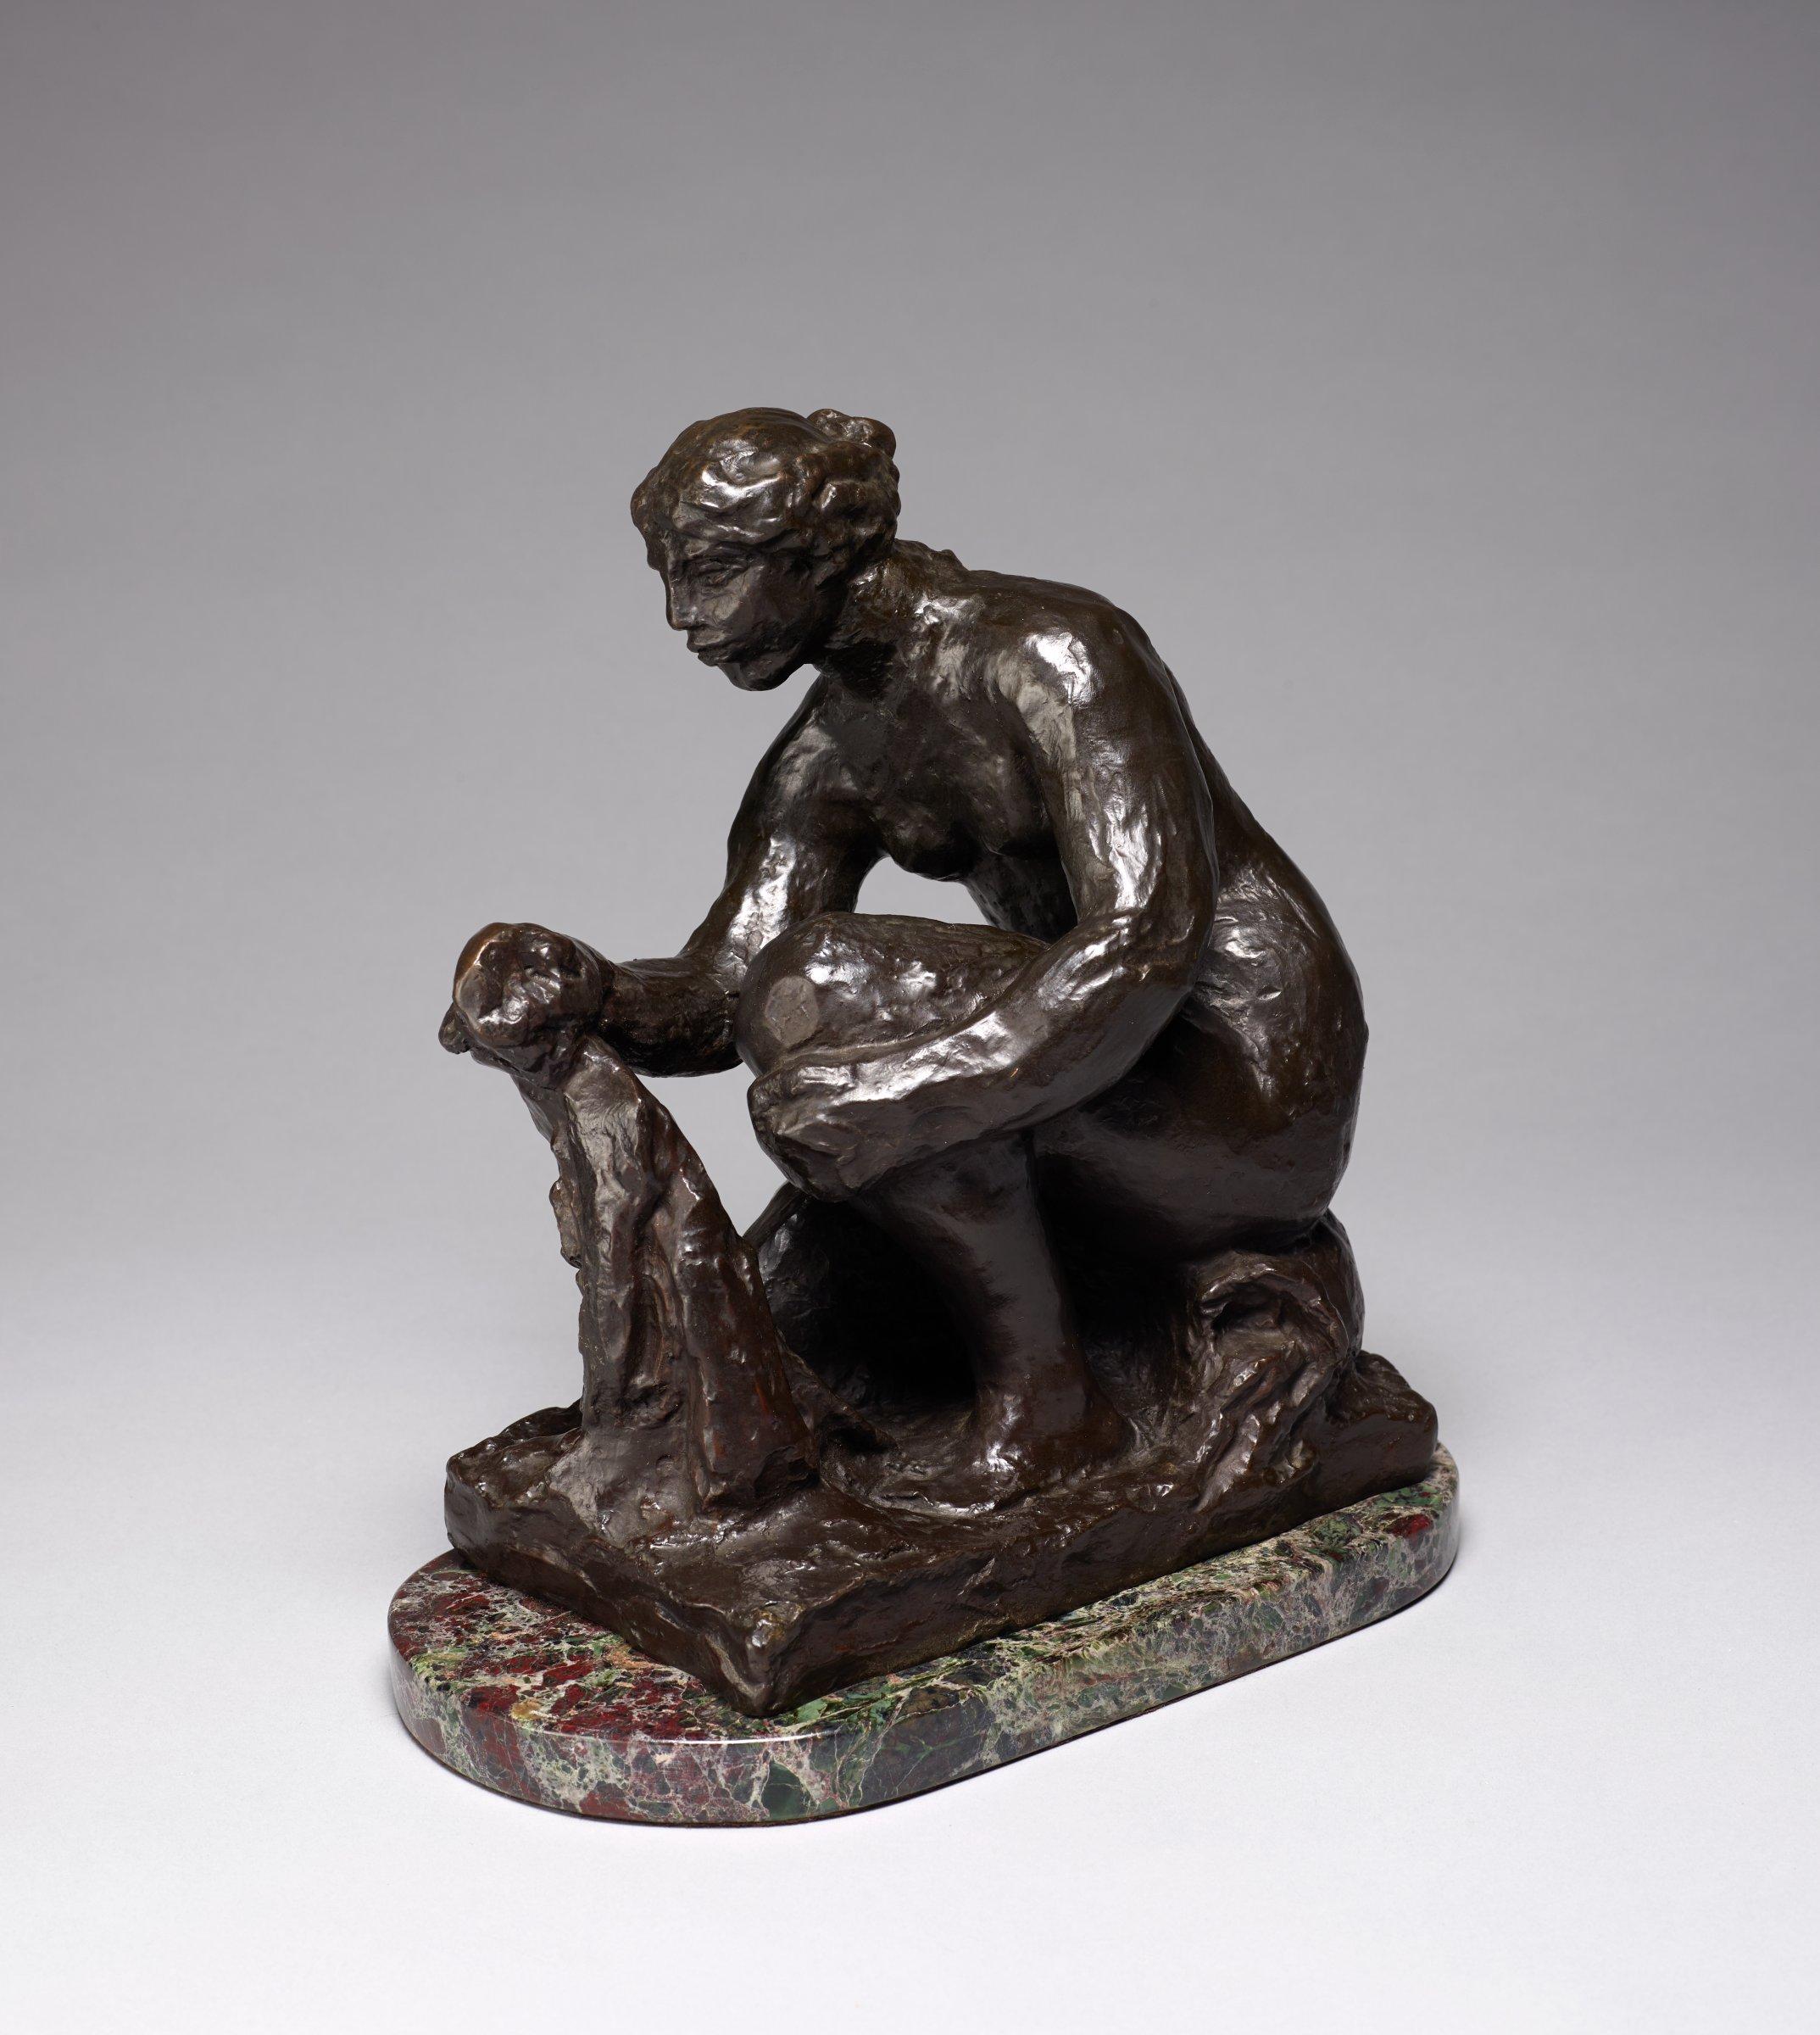 La petite laveuse (The Small Washerwoman), Pierre-Auguste Renoir, and Richard Guino, bronze